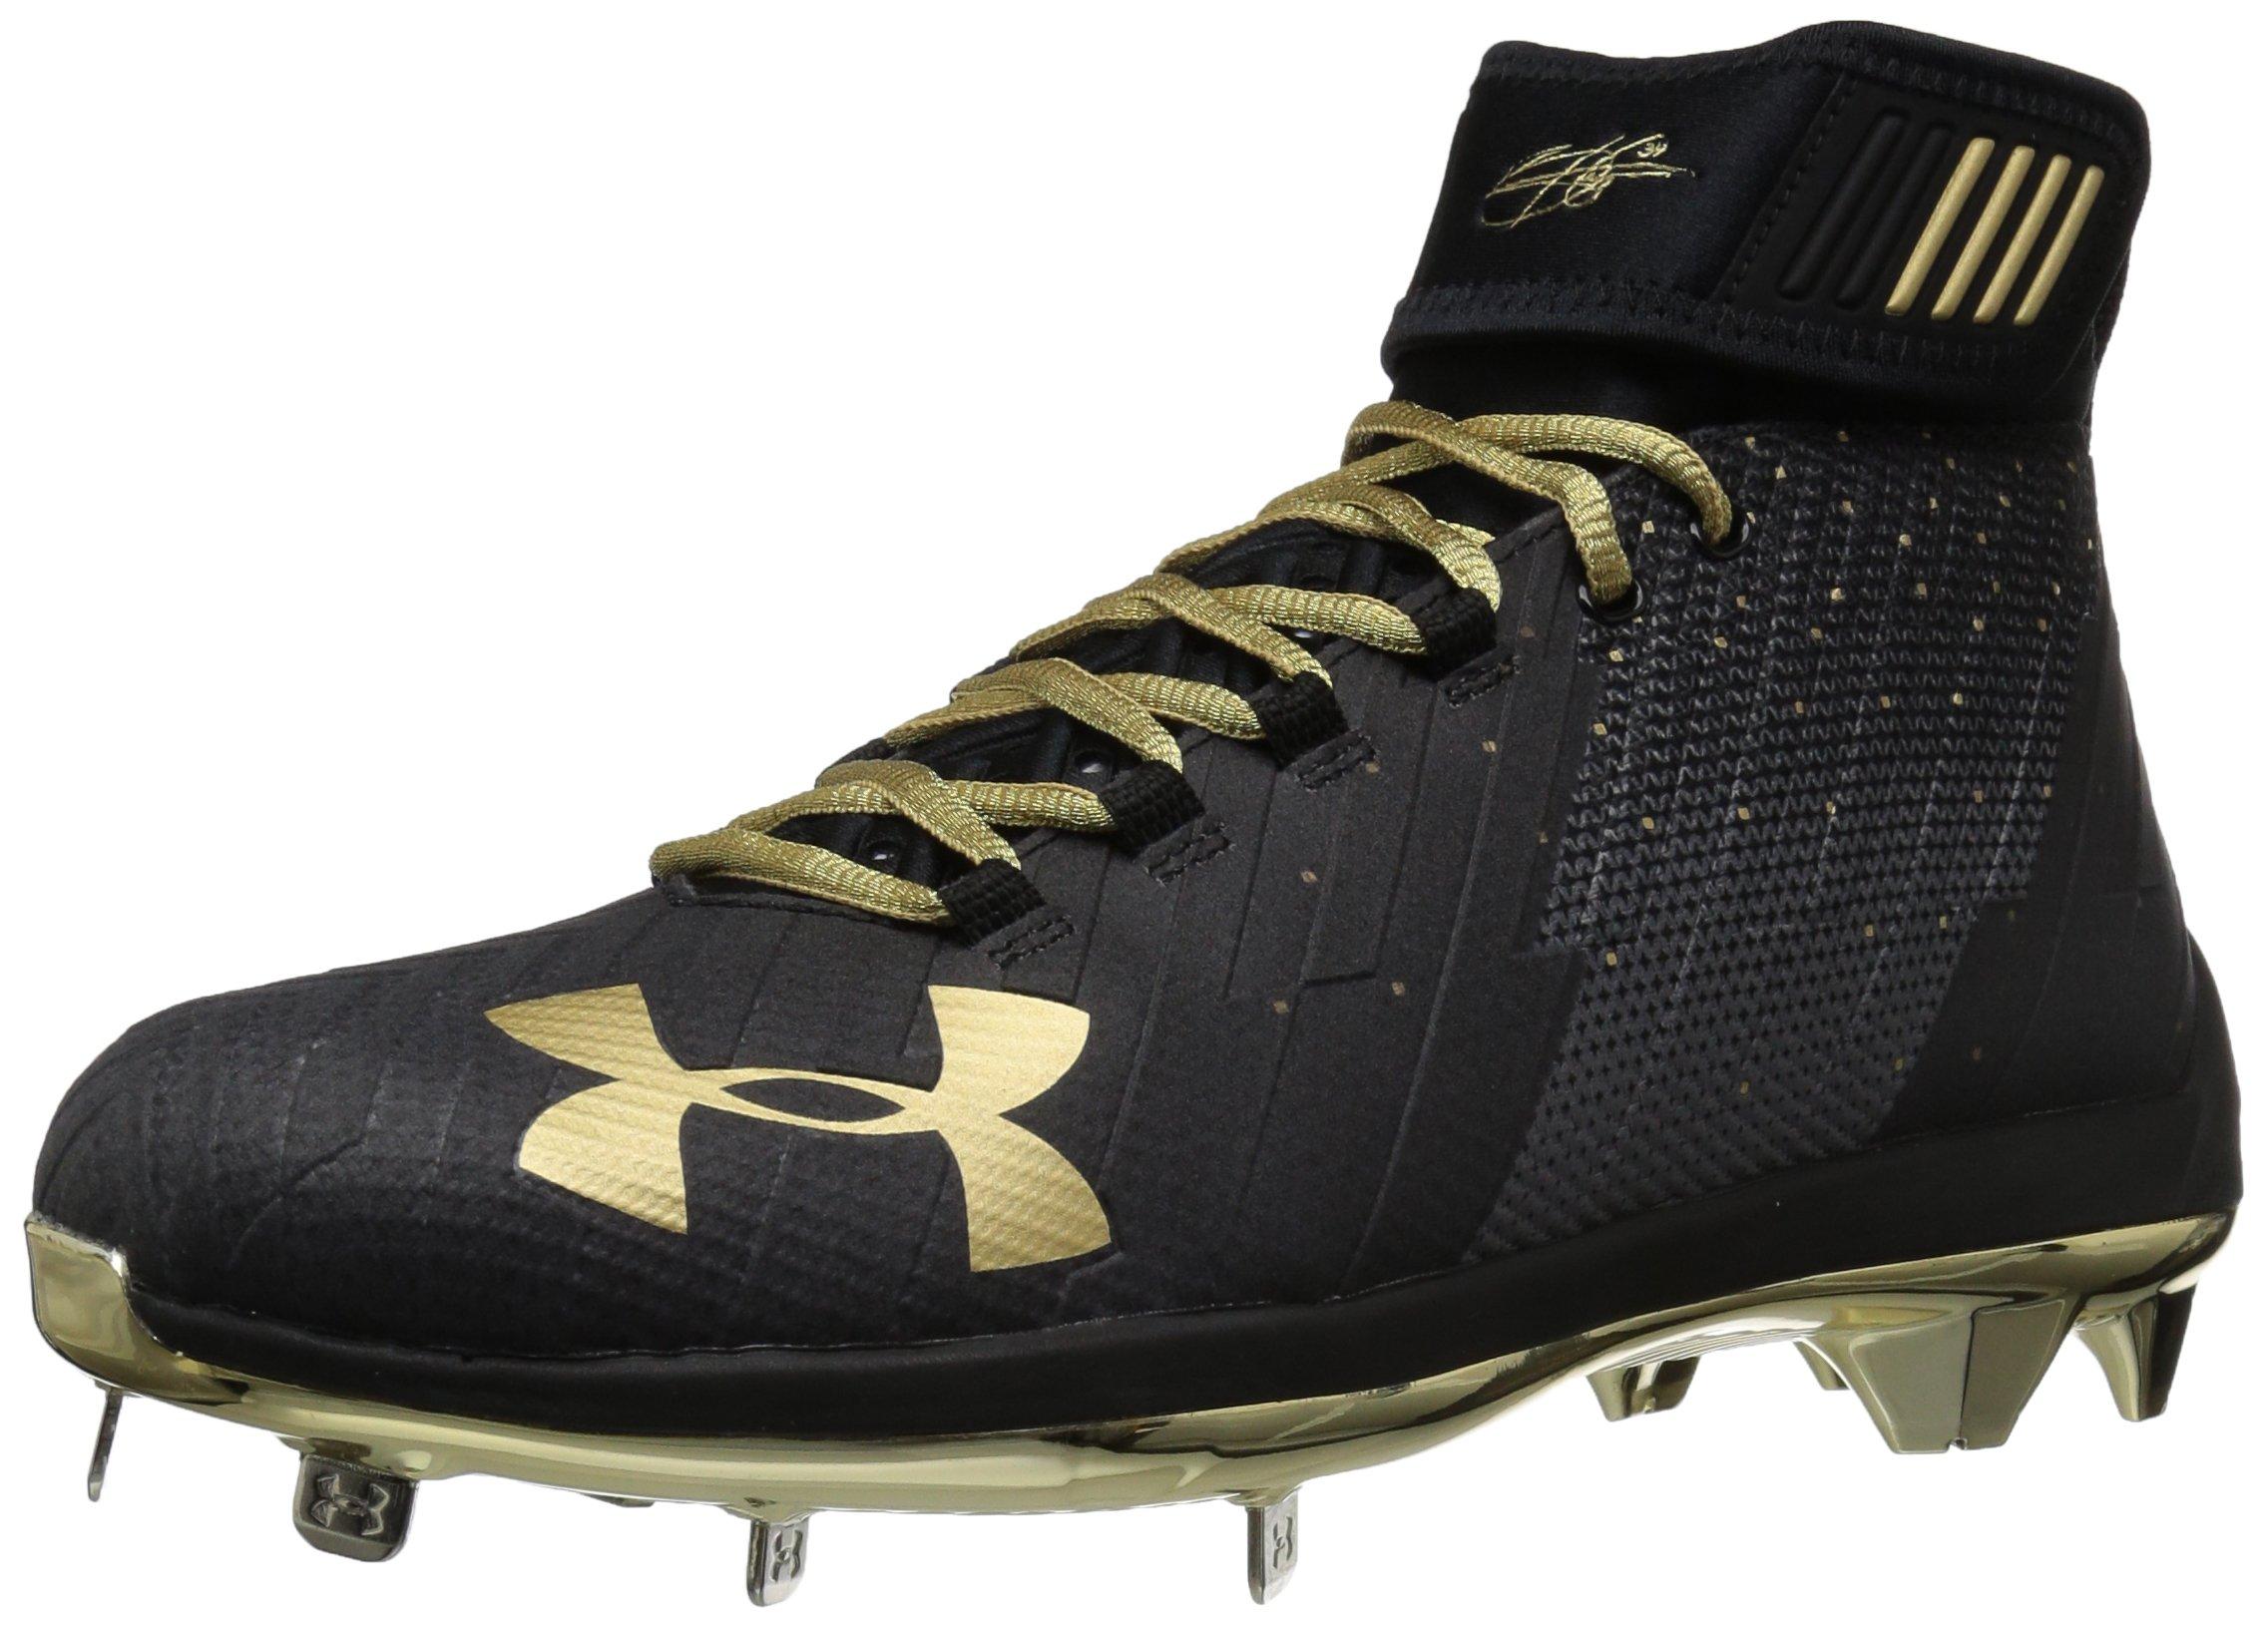 Under Armour Men's Harper 2 Mid ST-Limited Edition Baseball Shoe, Black (001)/Metallic Gold, 7